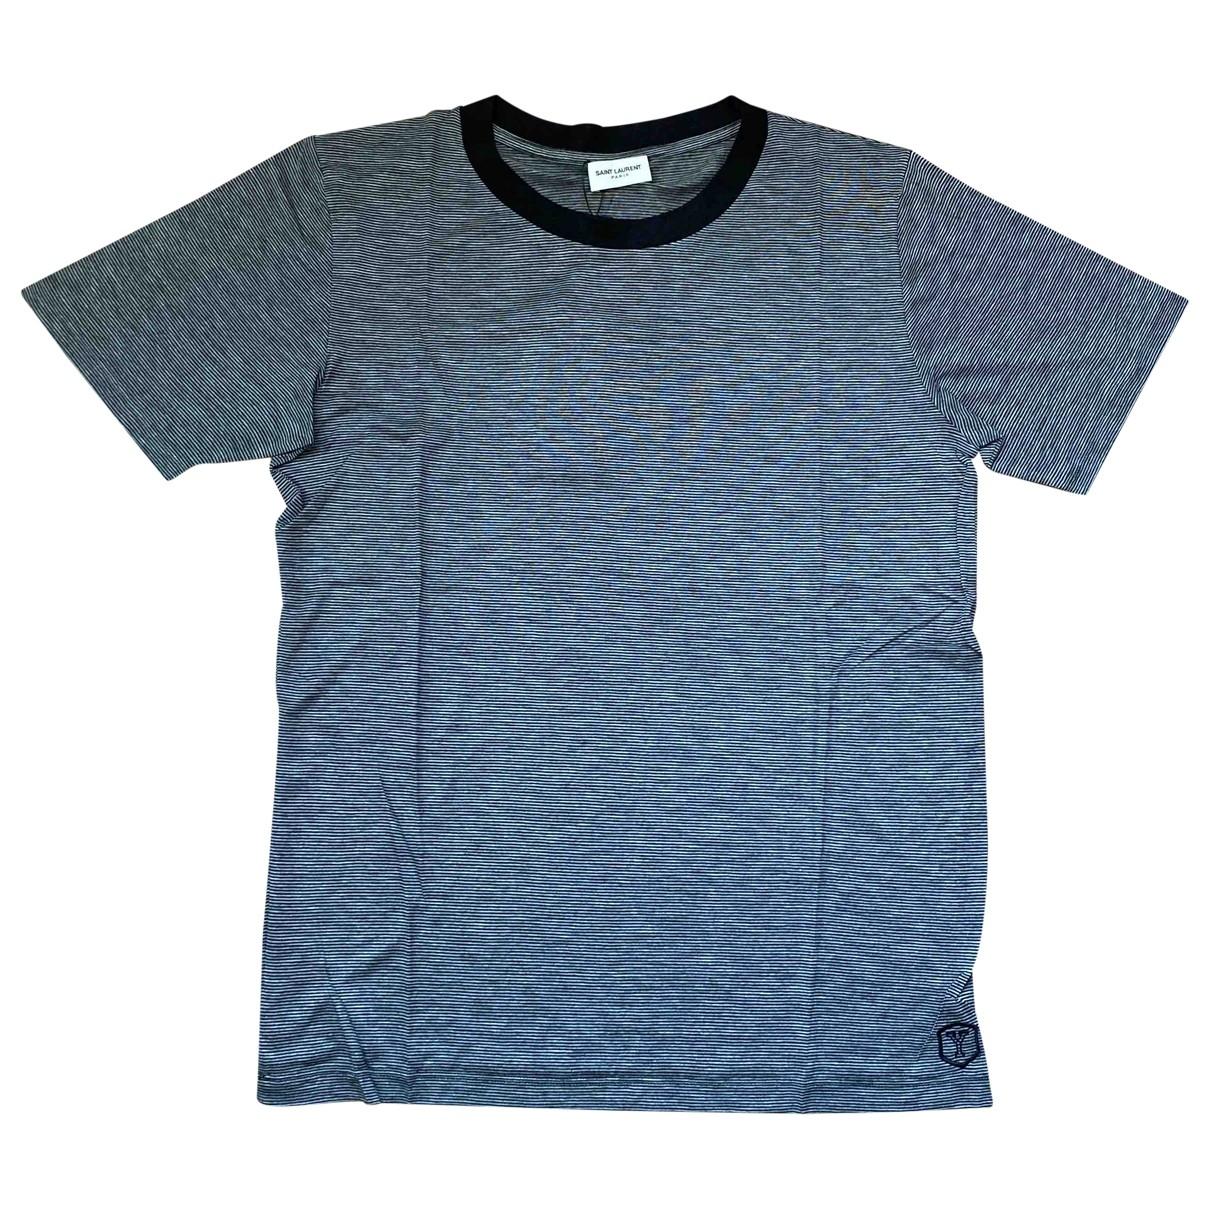 Saint Laurent \N Anthracite T-shirts for Men XS International